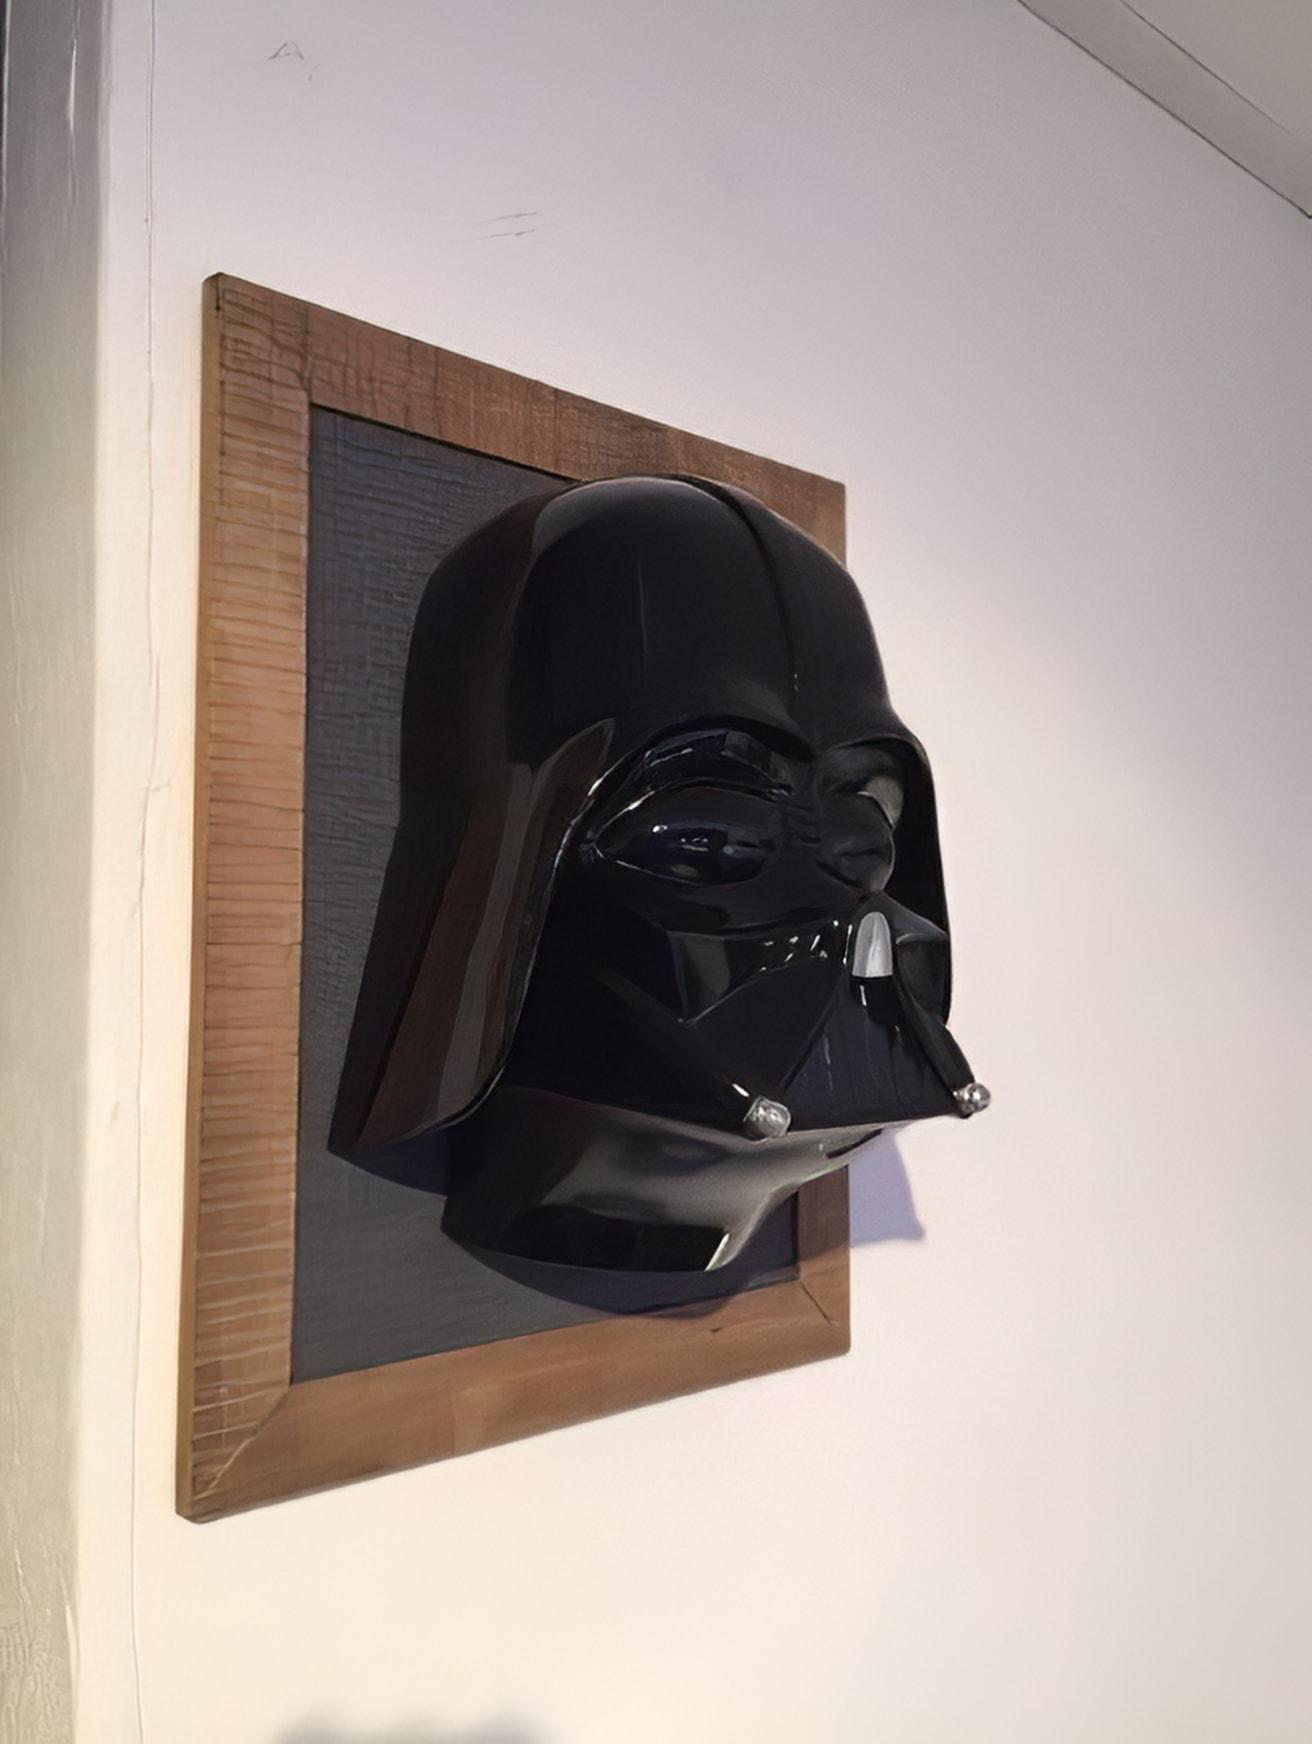 Painted  model Darth Vader